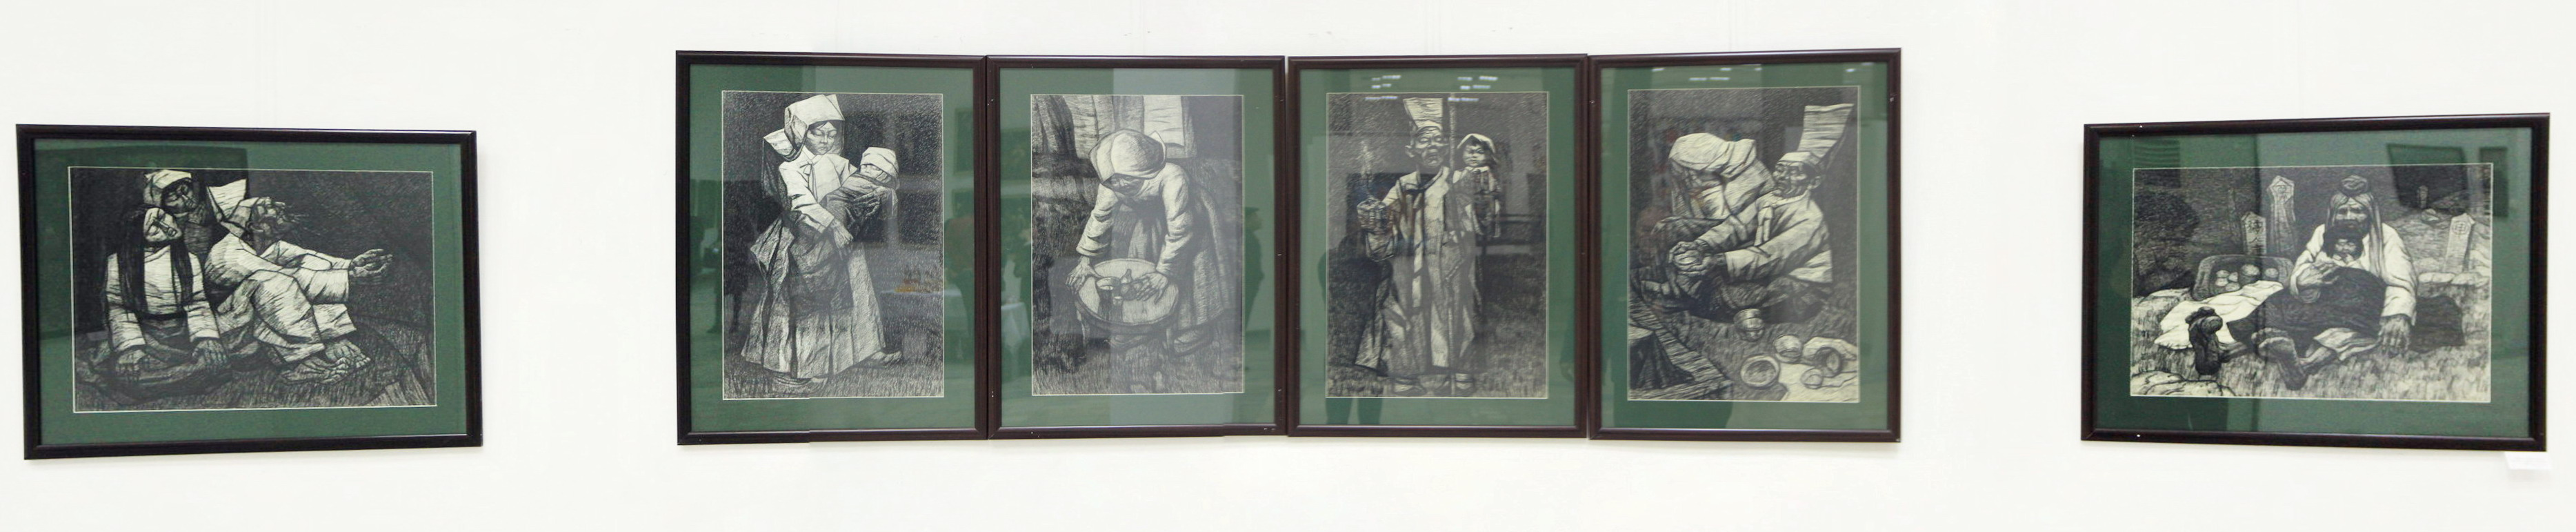 Николай Шин. Портрет к картине Легенда. 1981